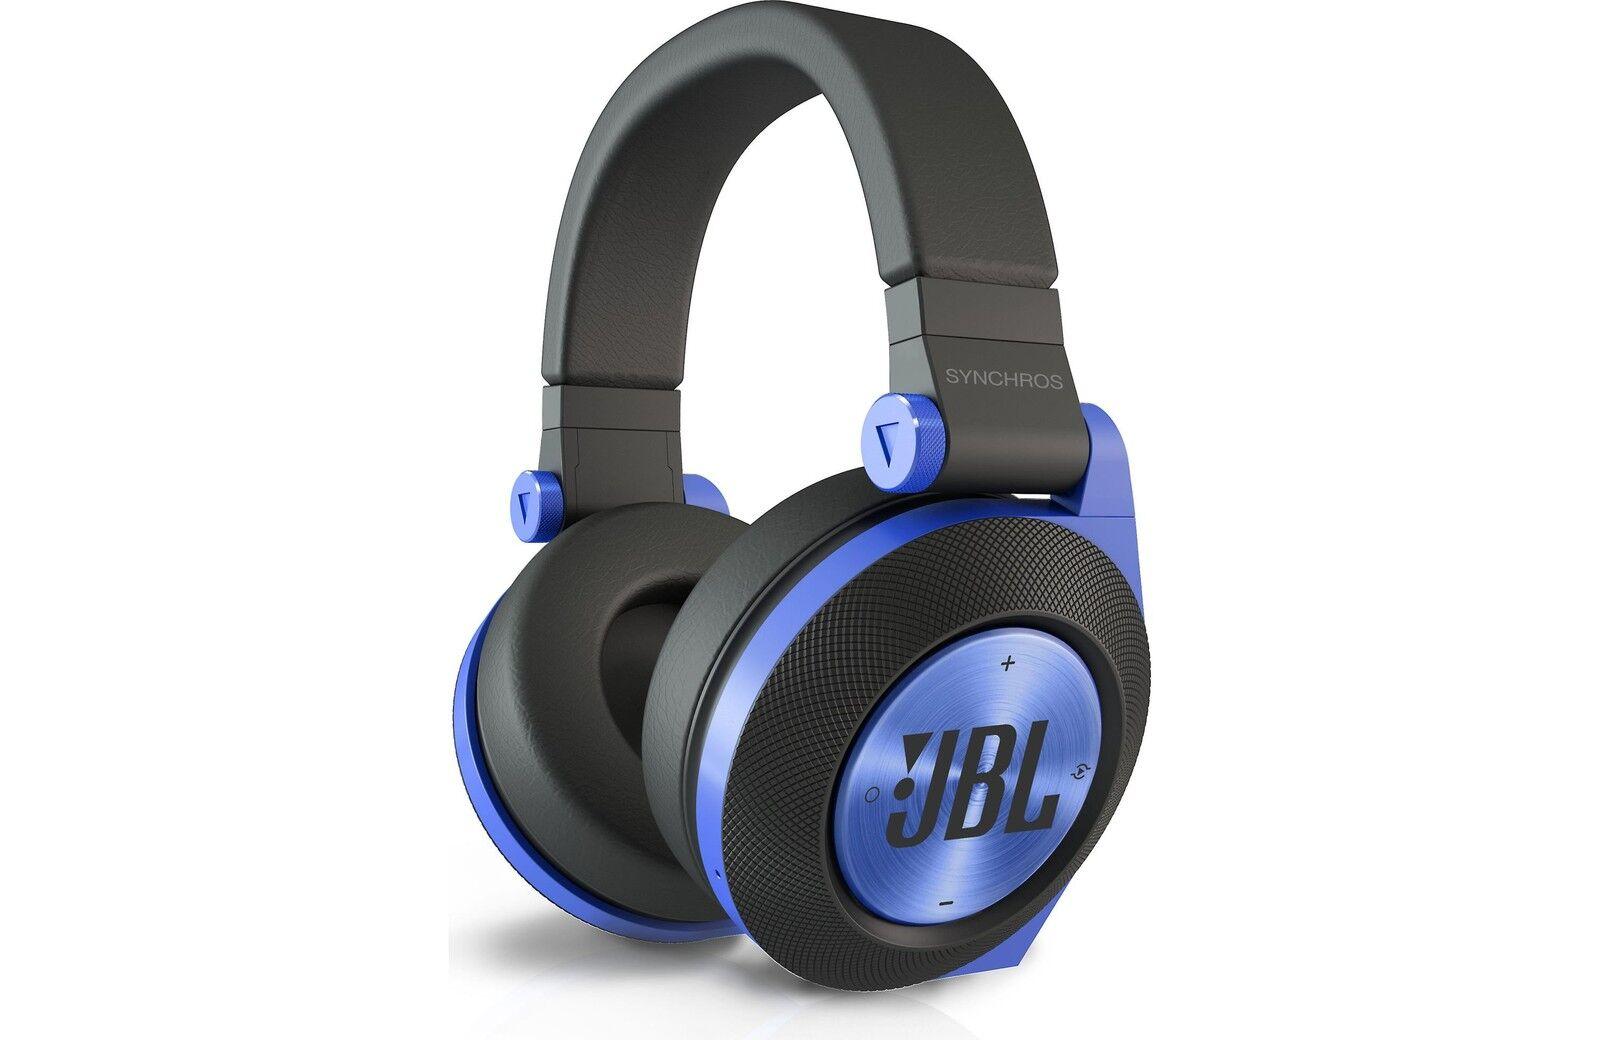 jbl bluetooth headphones. picture 1 of 4 jbl bluetooth headphones